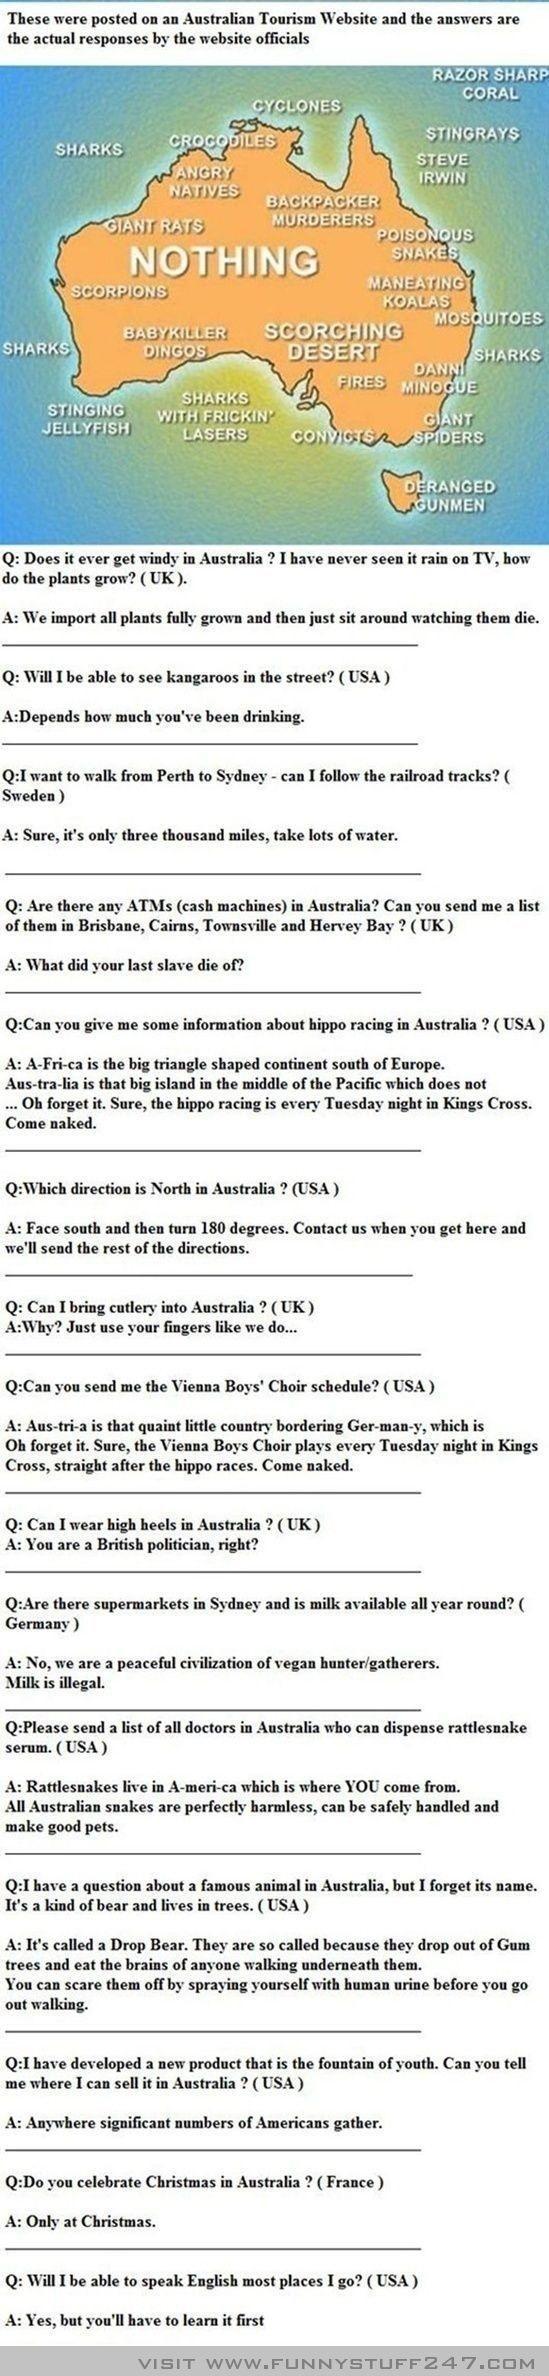 Dating site jokes in Sydney